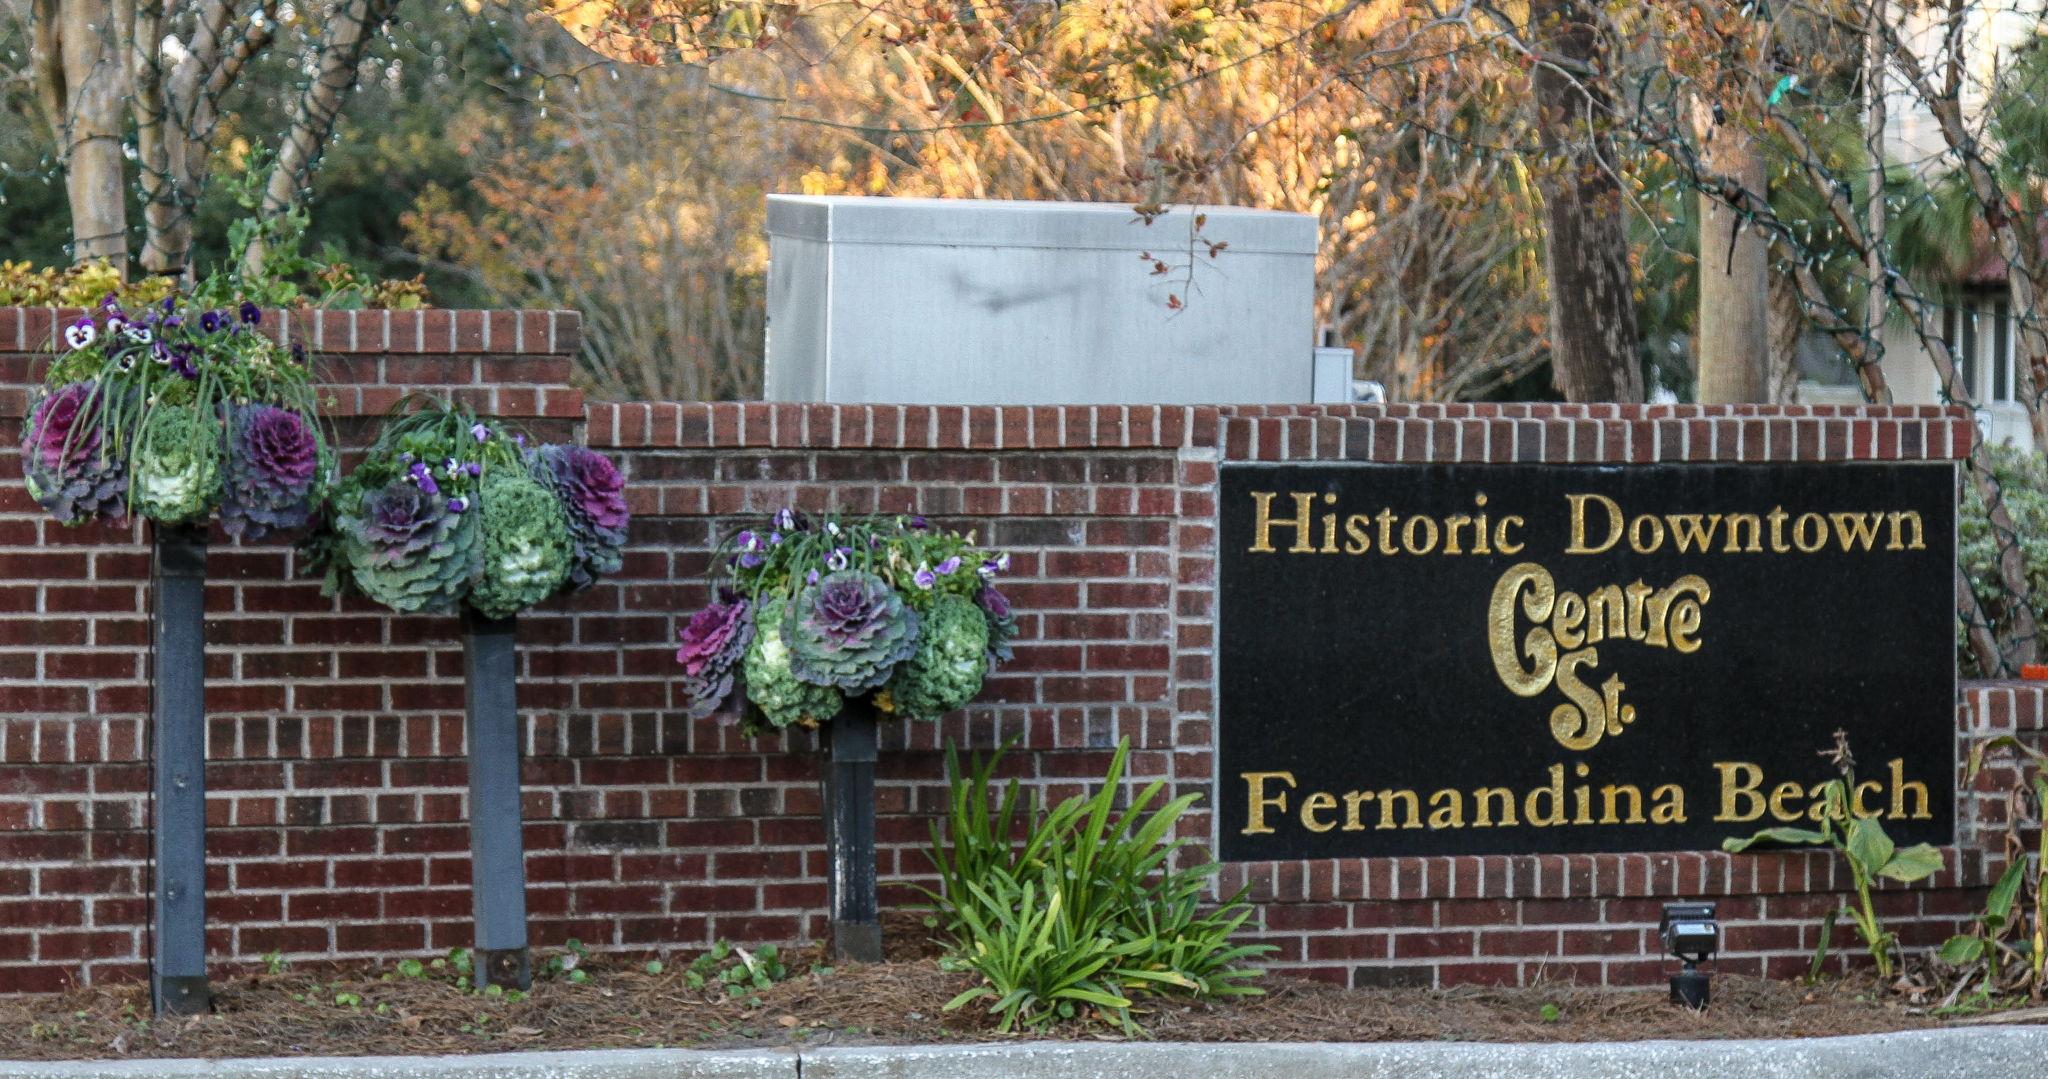 Only three miles away, historic Fernandina Beach